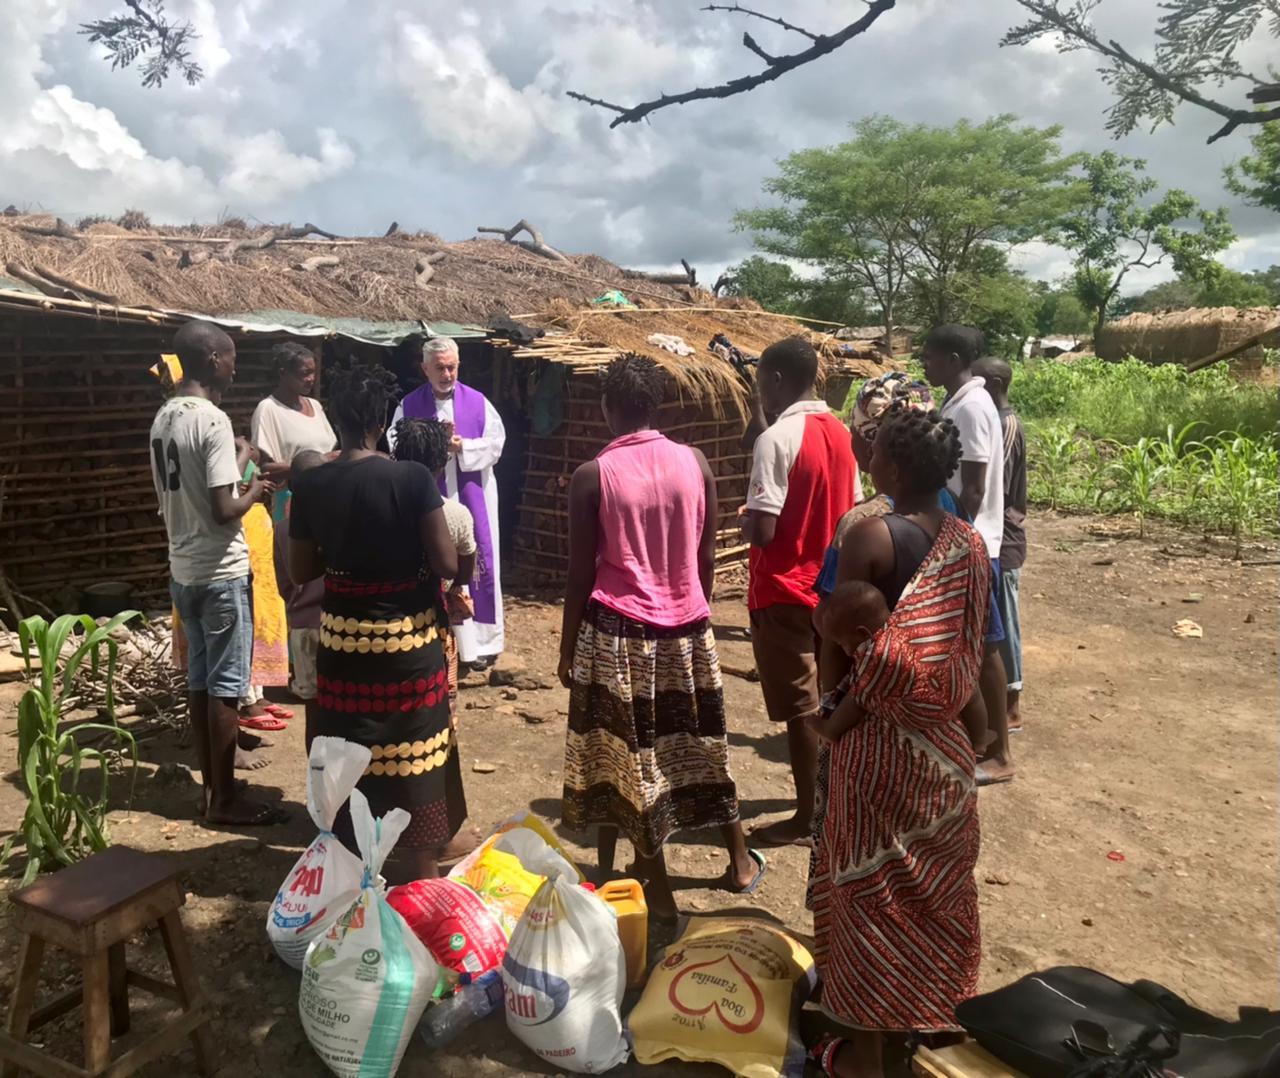 Notícias de Cabo Delgado-Moçambique (Por Pe. Edegard Silva Jr.)